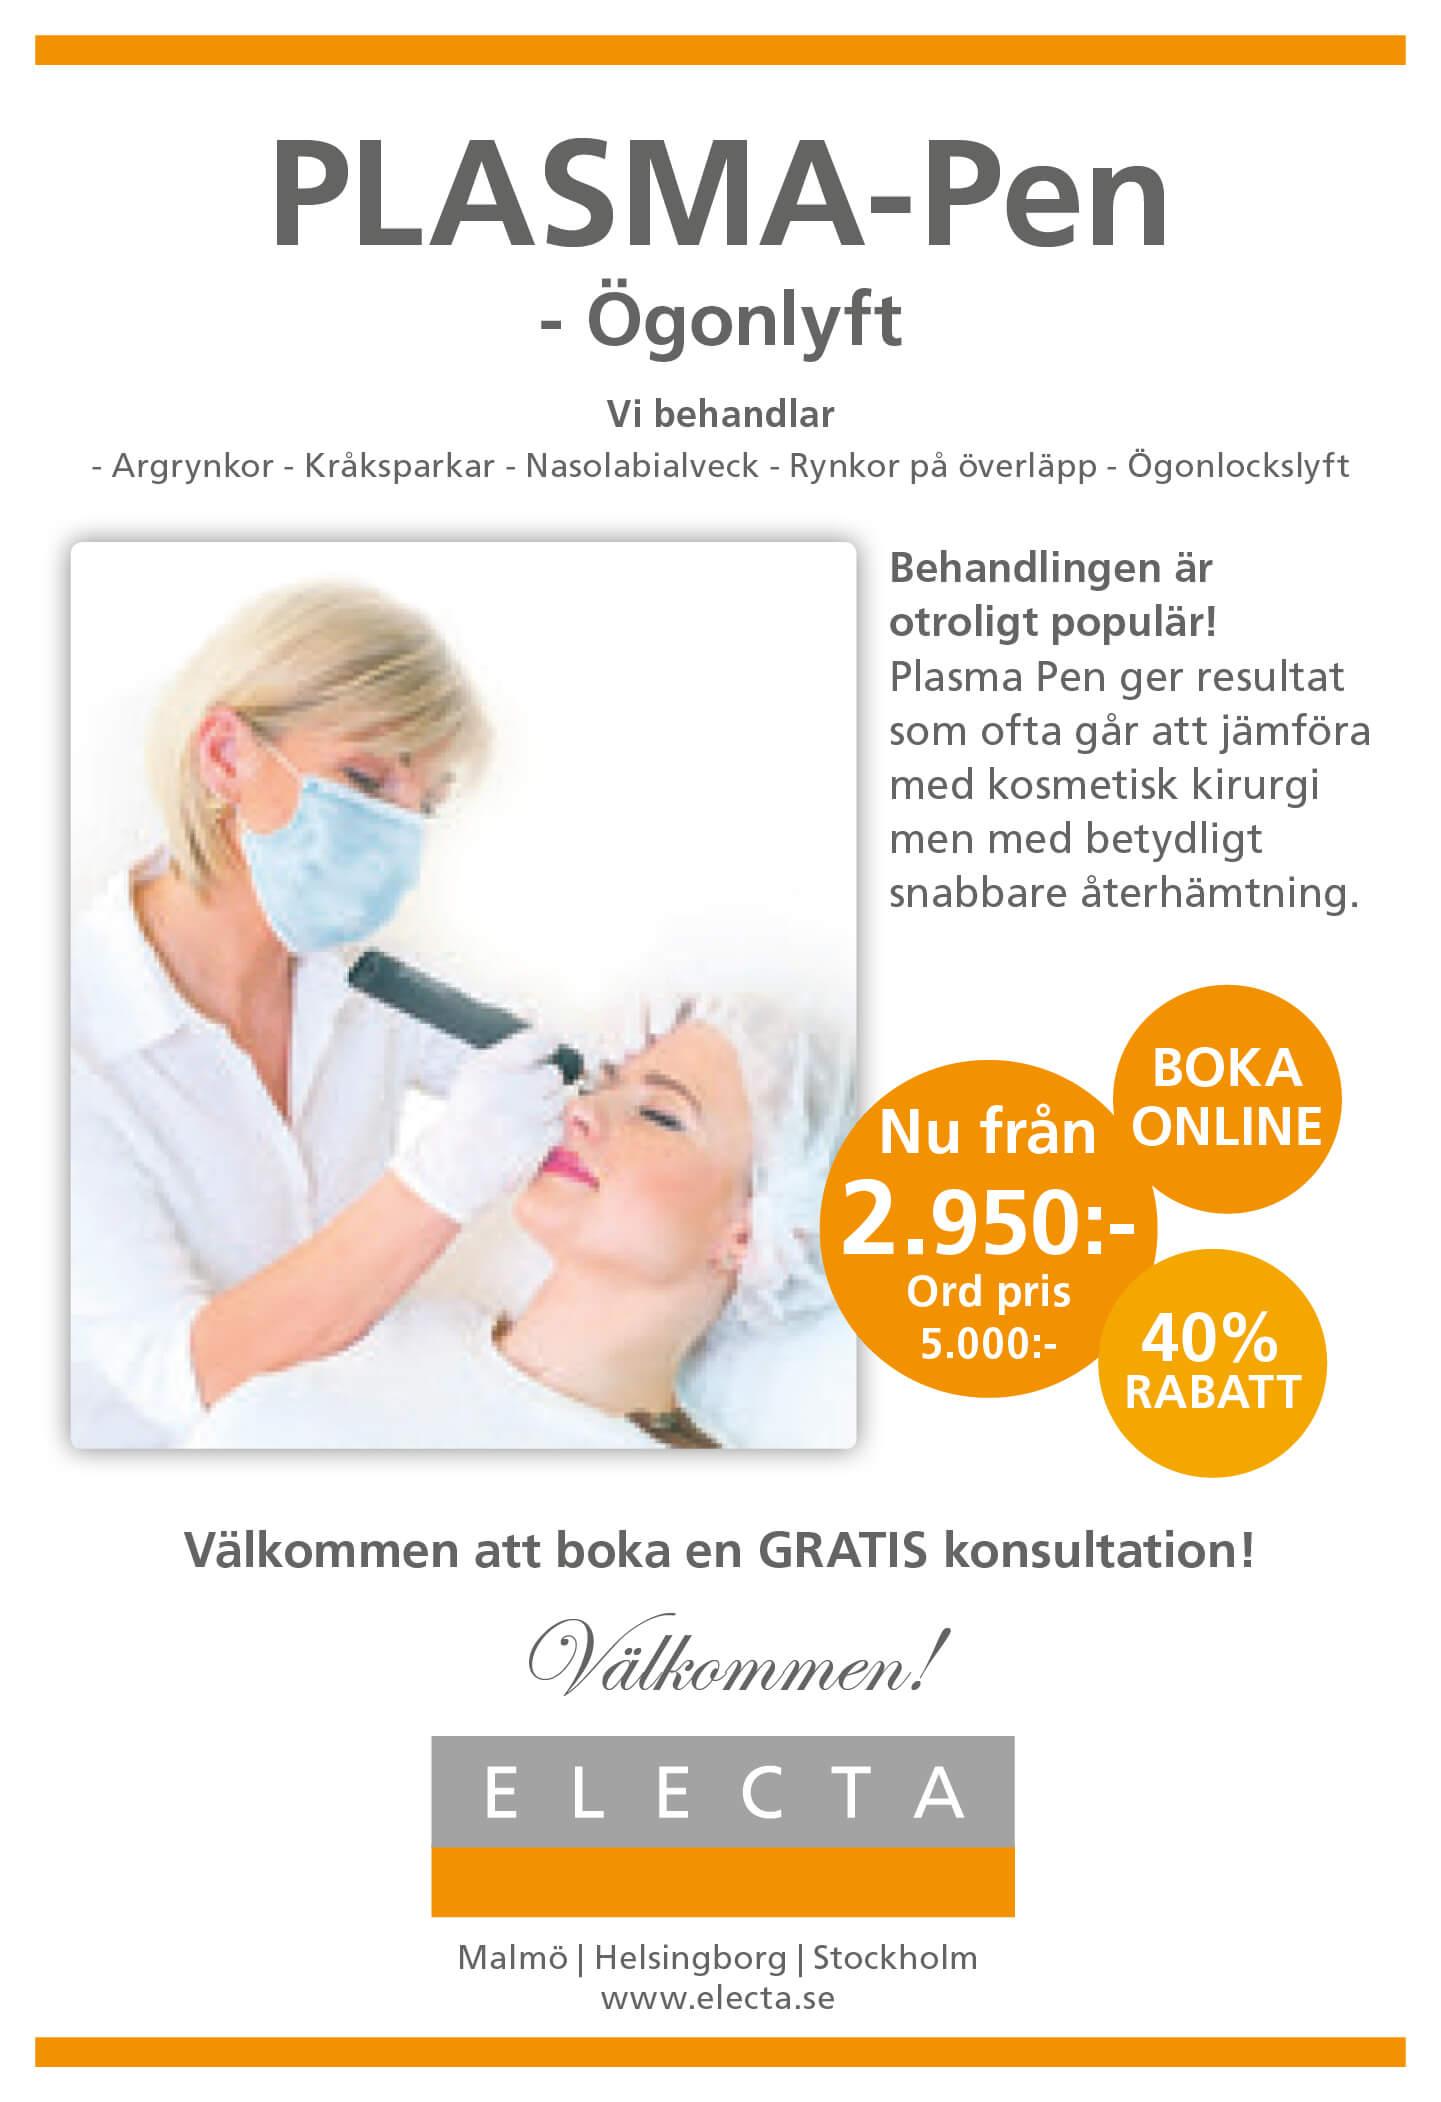 ansiktsbehandling helsingborg erbjudande